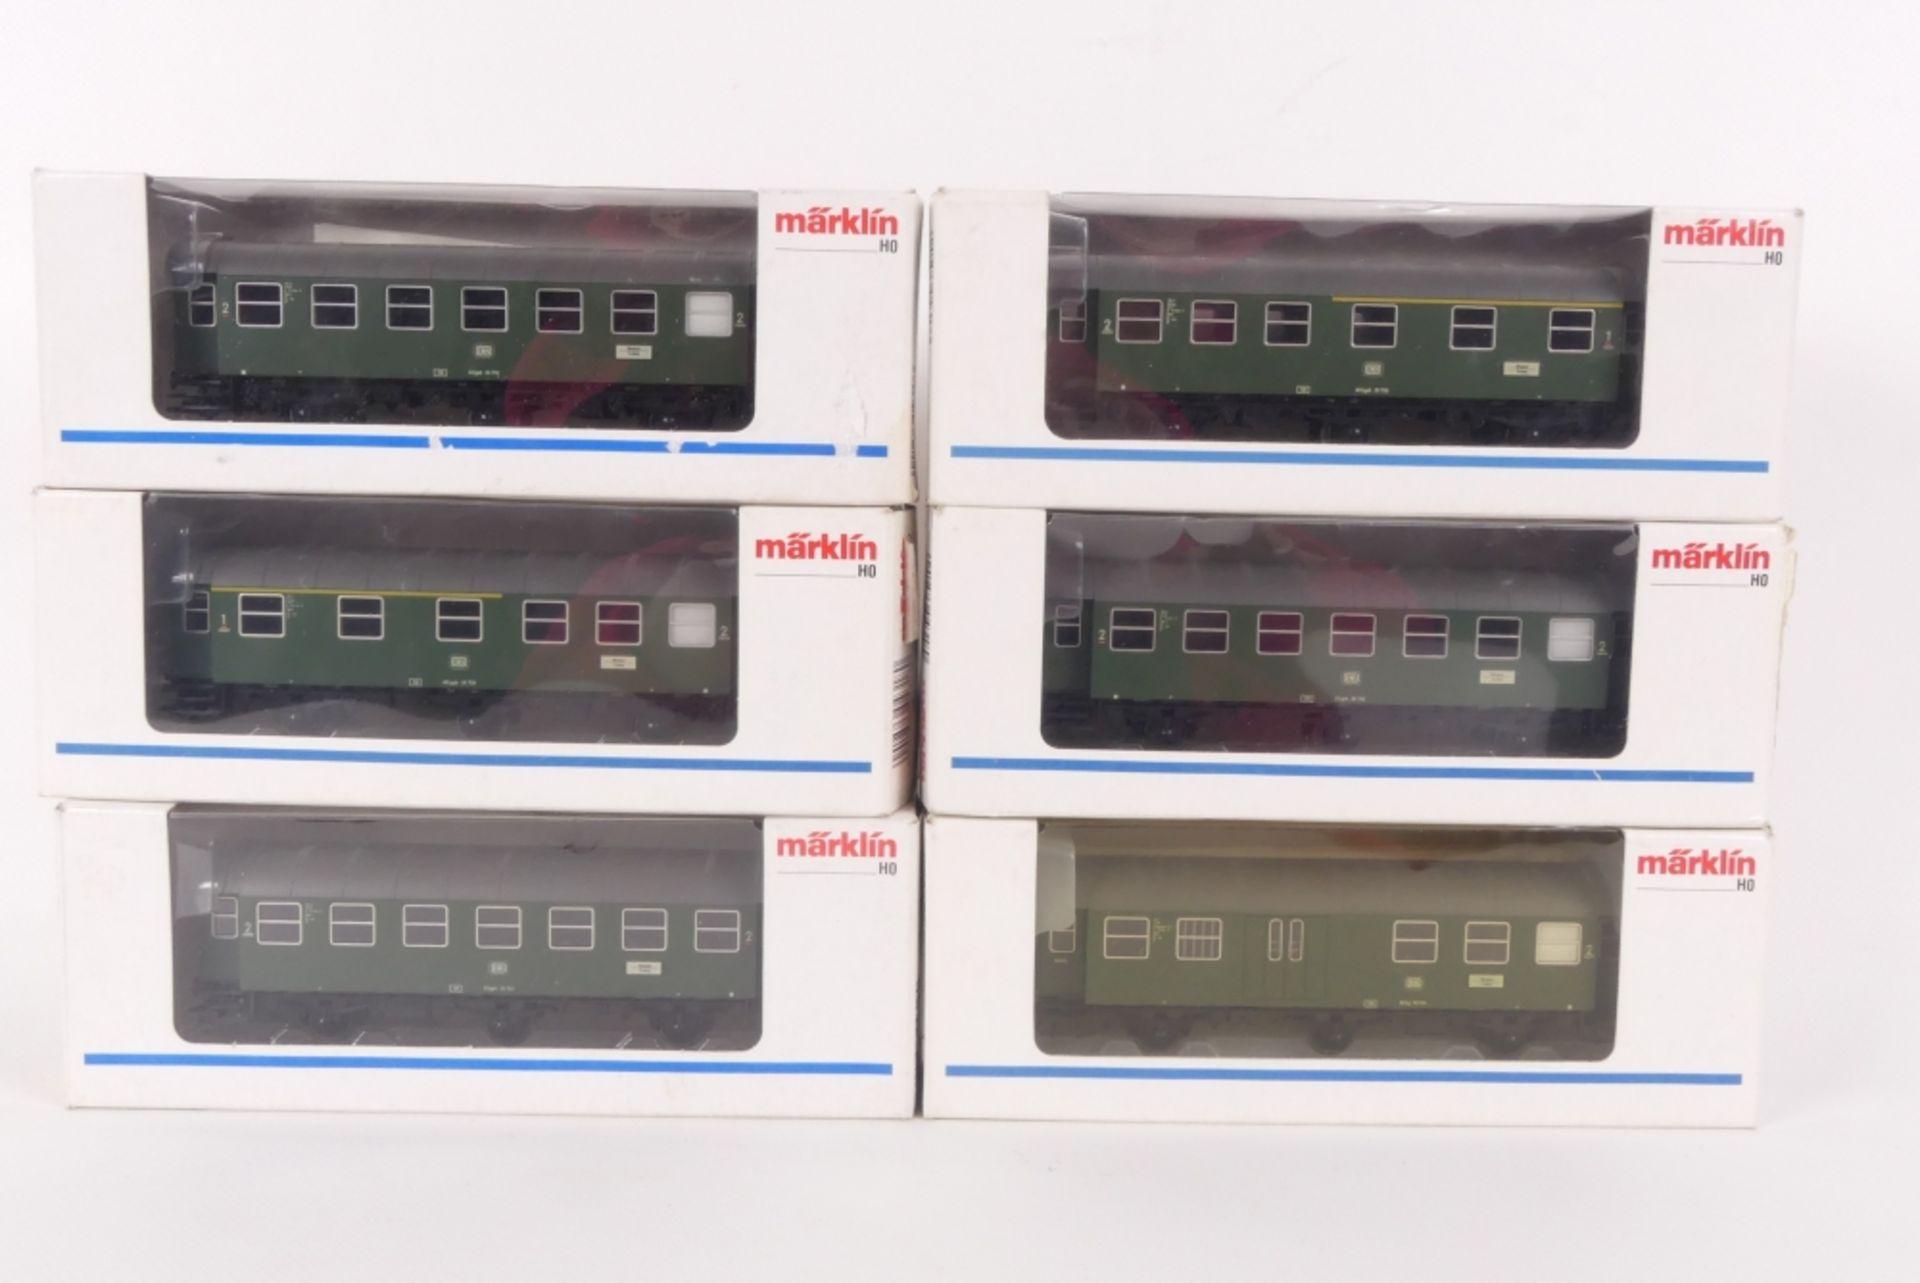 Märklin sechs GüterwagenMärklin sechs Güterwagen, zwei 4317, drei 4318, 4319, sehr